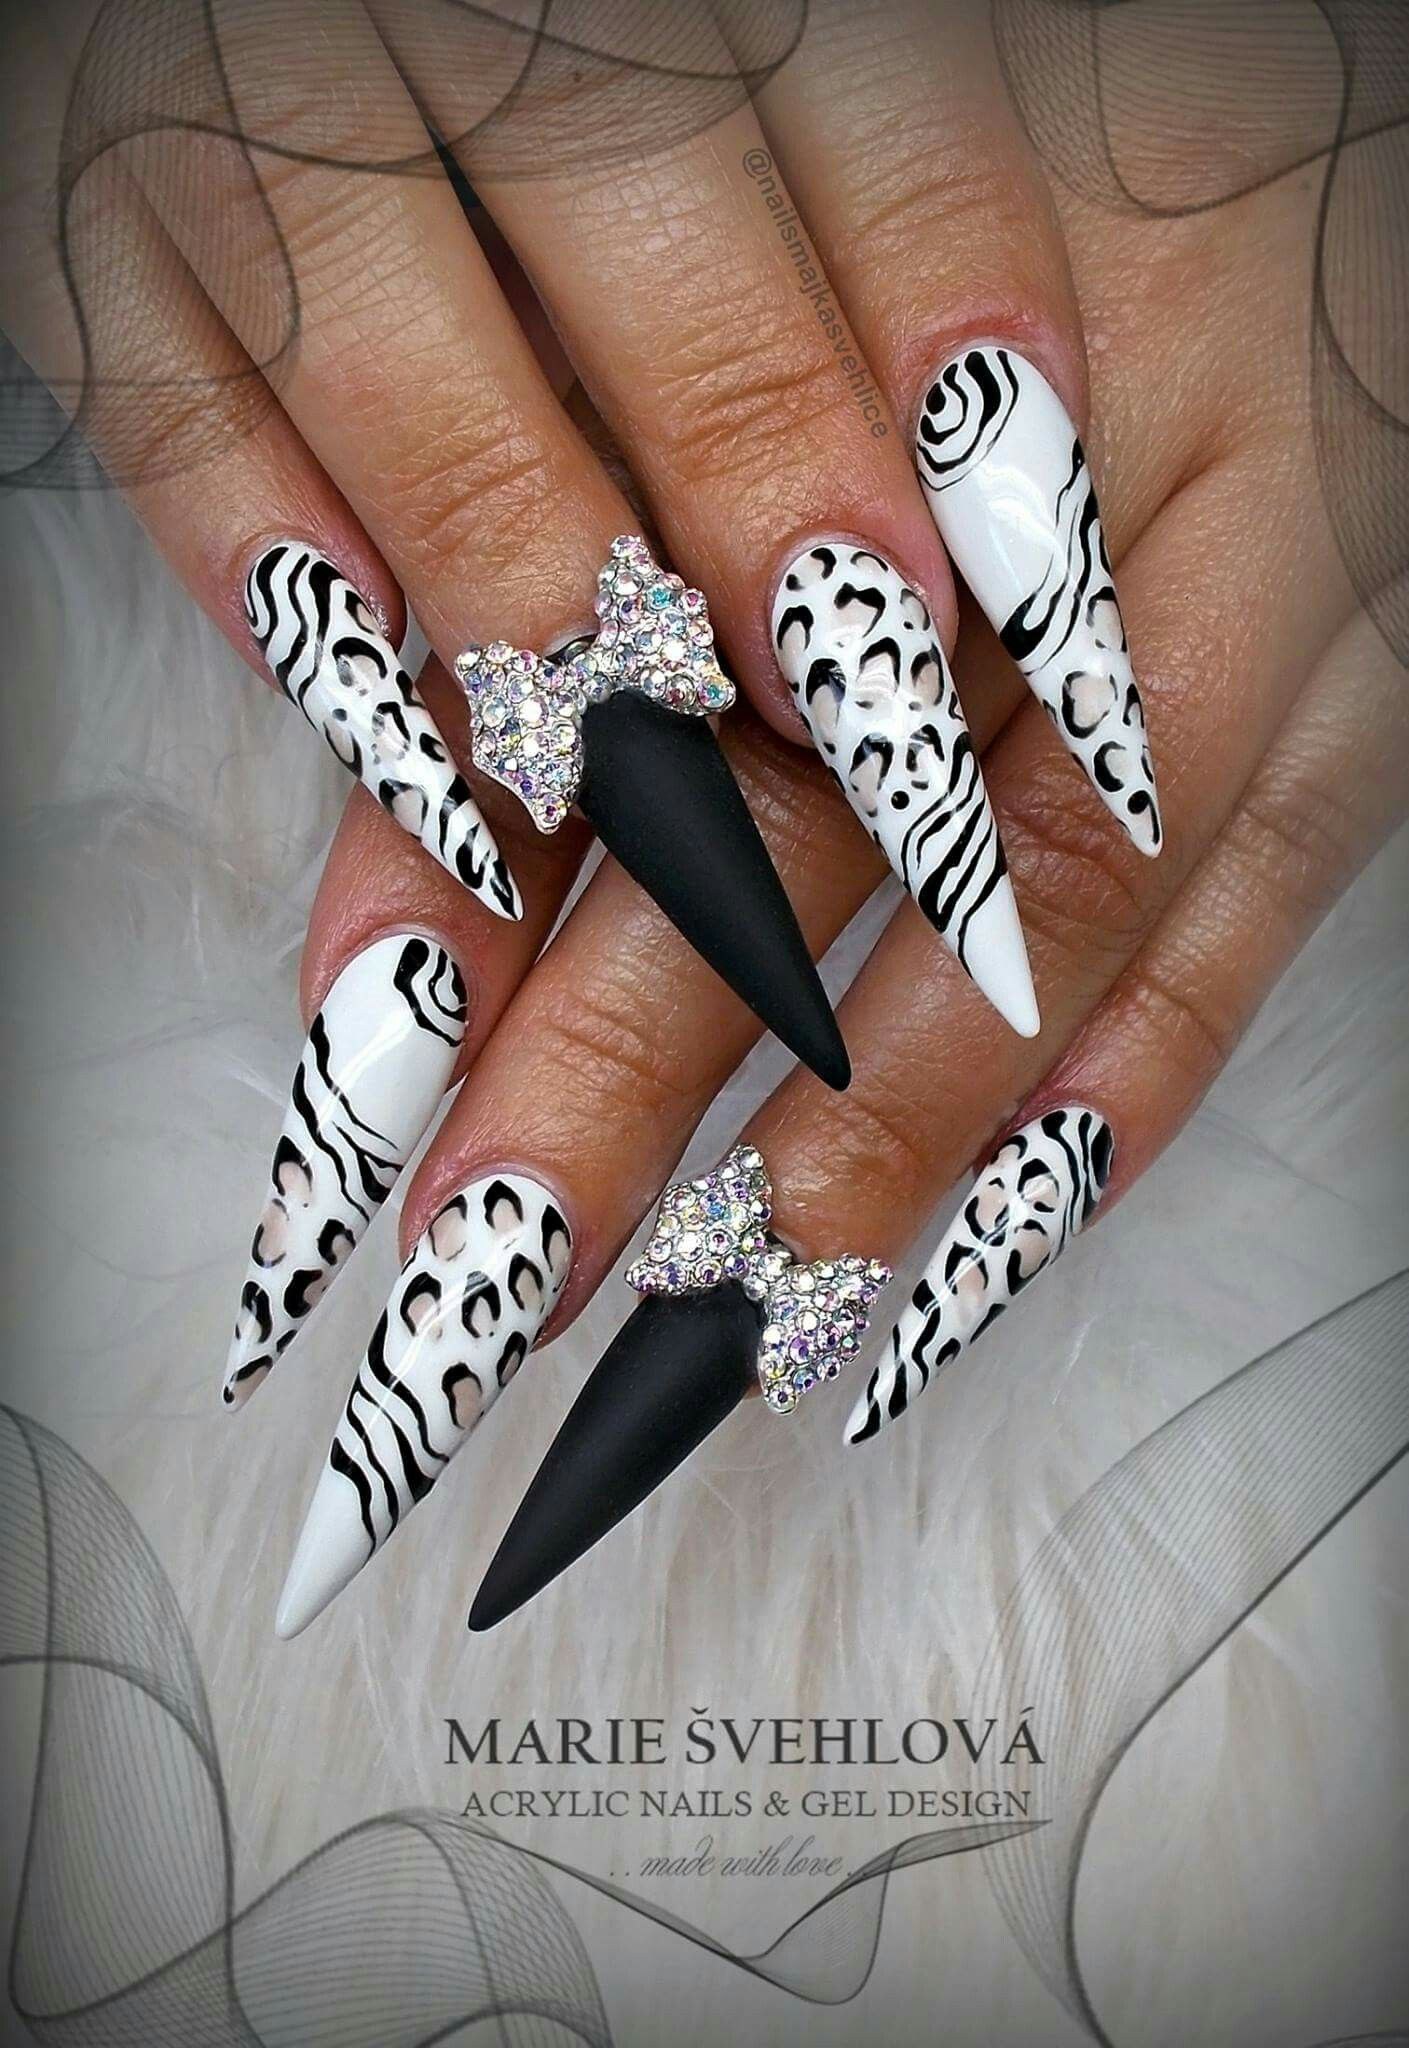 Acrylic Nails Gel Design Long Nails Black White Nails Glitter Nails Acrylic Nail Designs Bling Nails